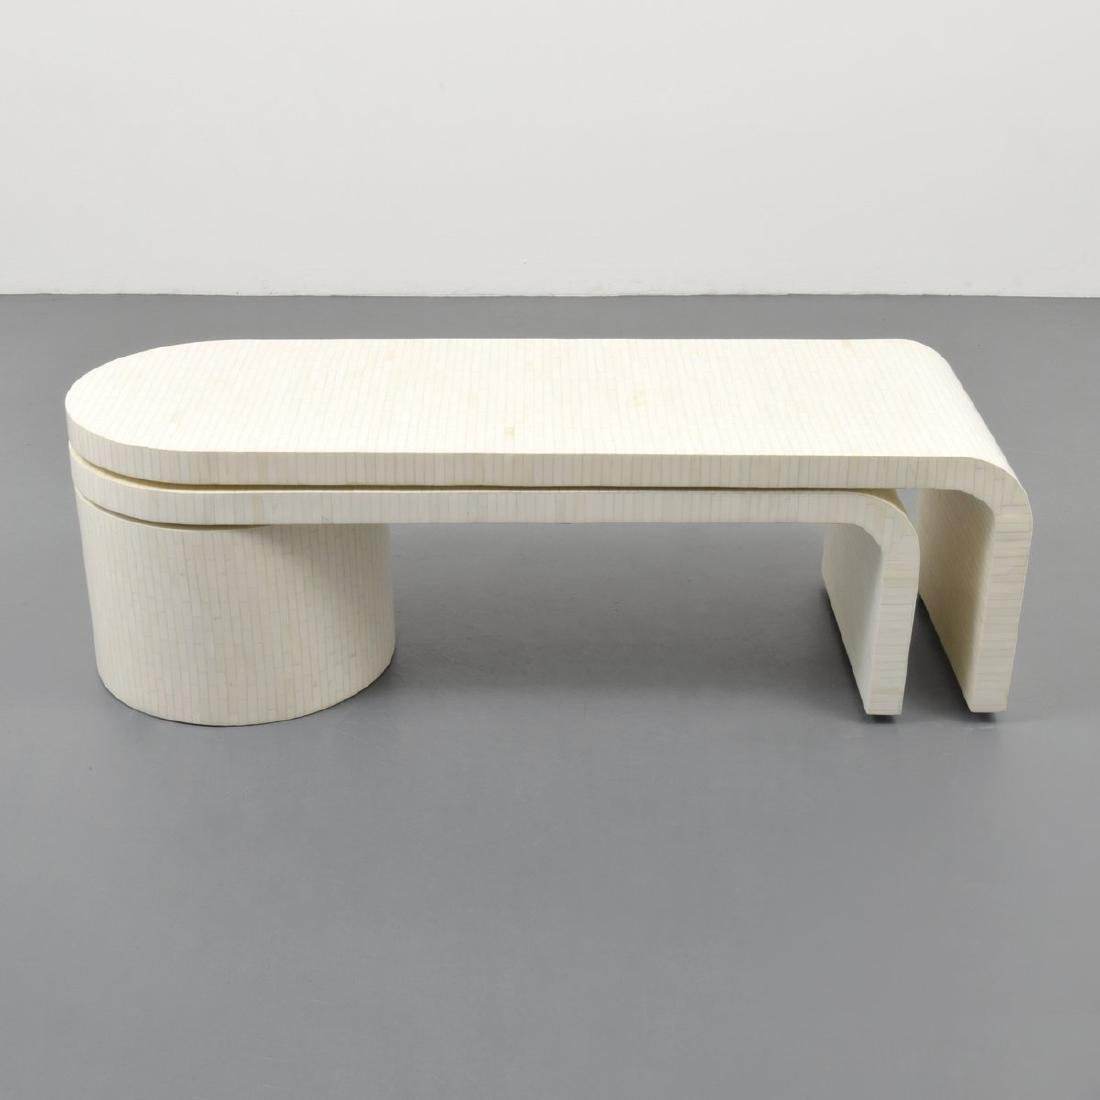 Tessellated Bone Coffee Table, Manner of Karl Springer - 4